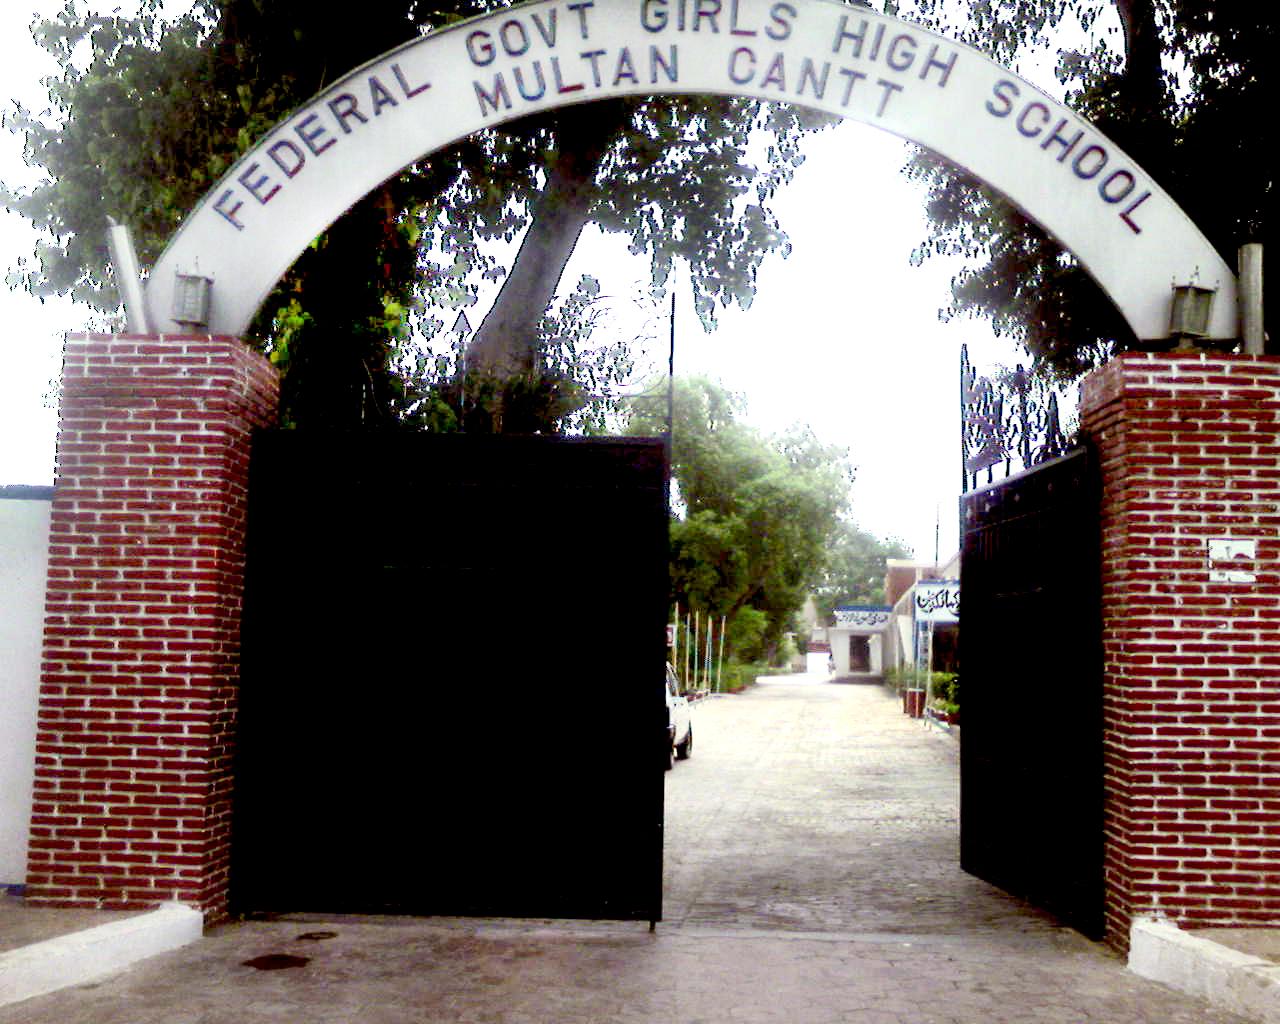 FG Girls High School Multan Cantt entrance gate